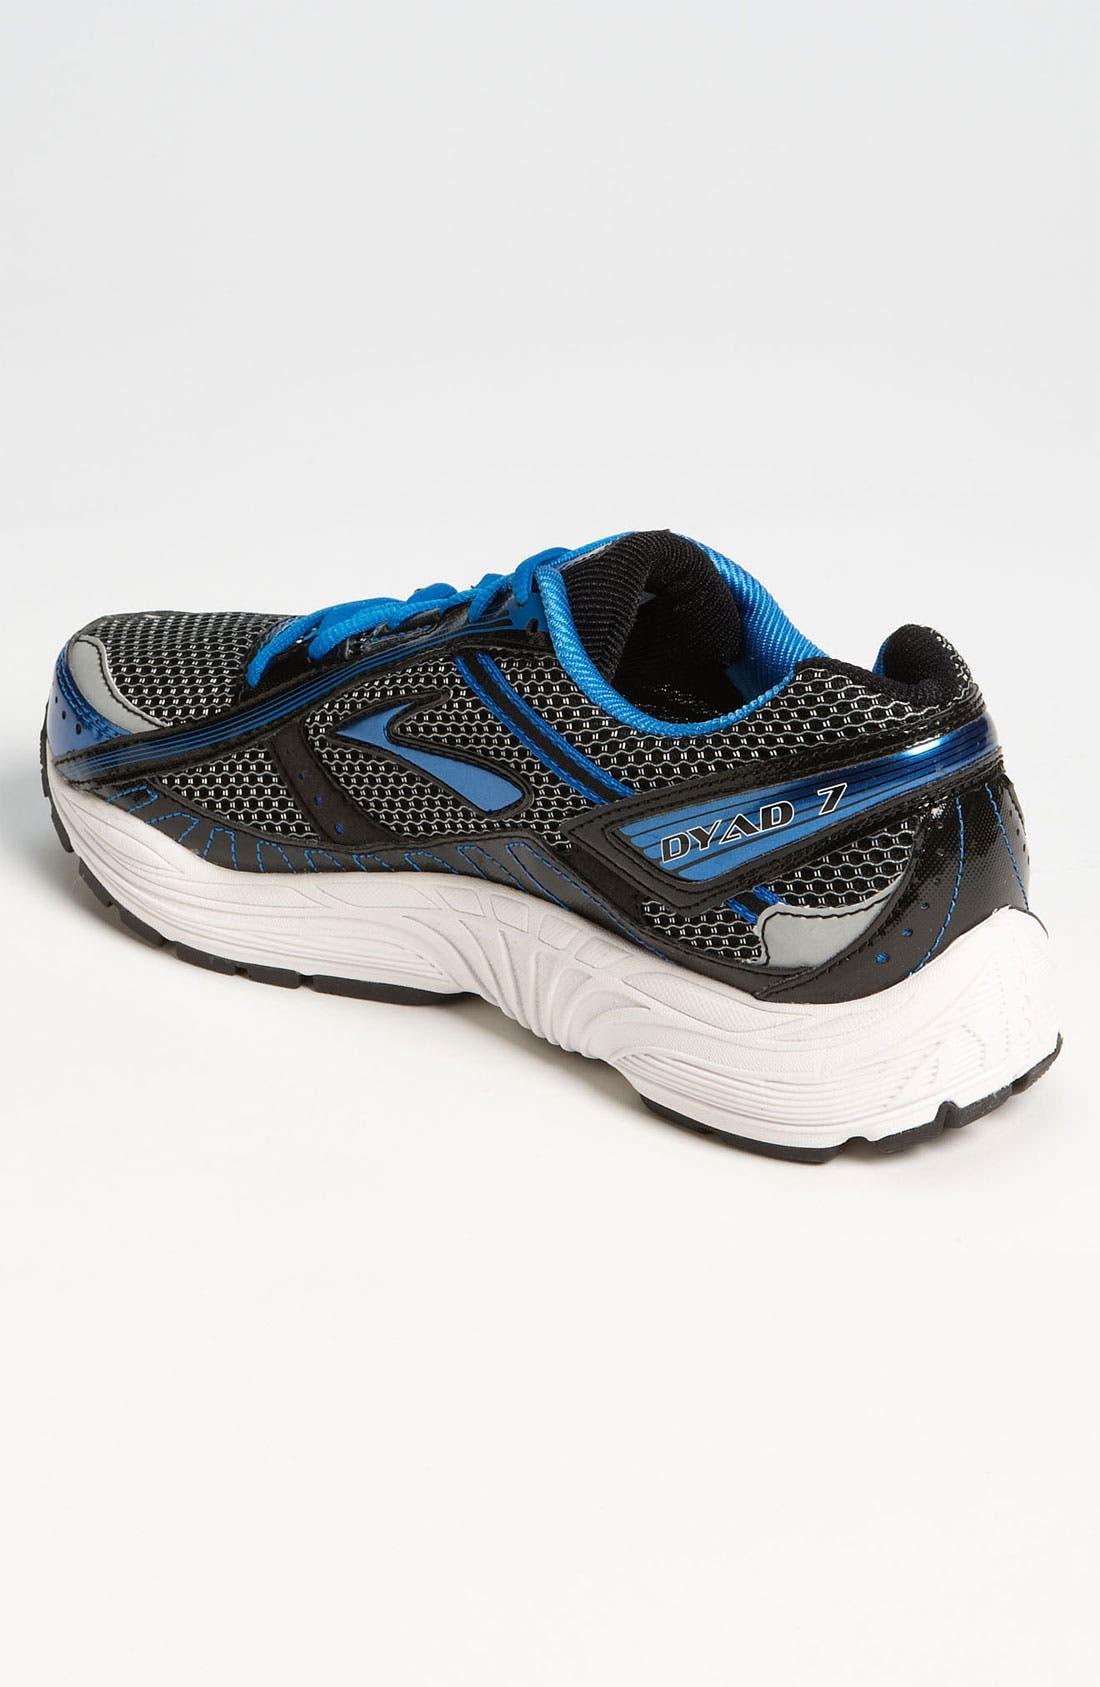 Alternate Image 2  - Brooks 'DYAD 7' Running Shoe (Men)